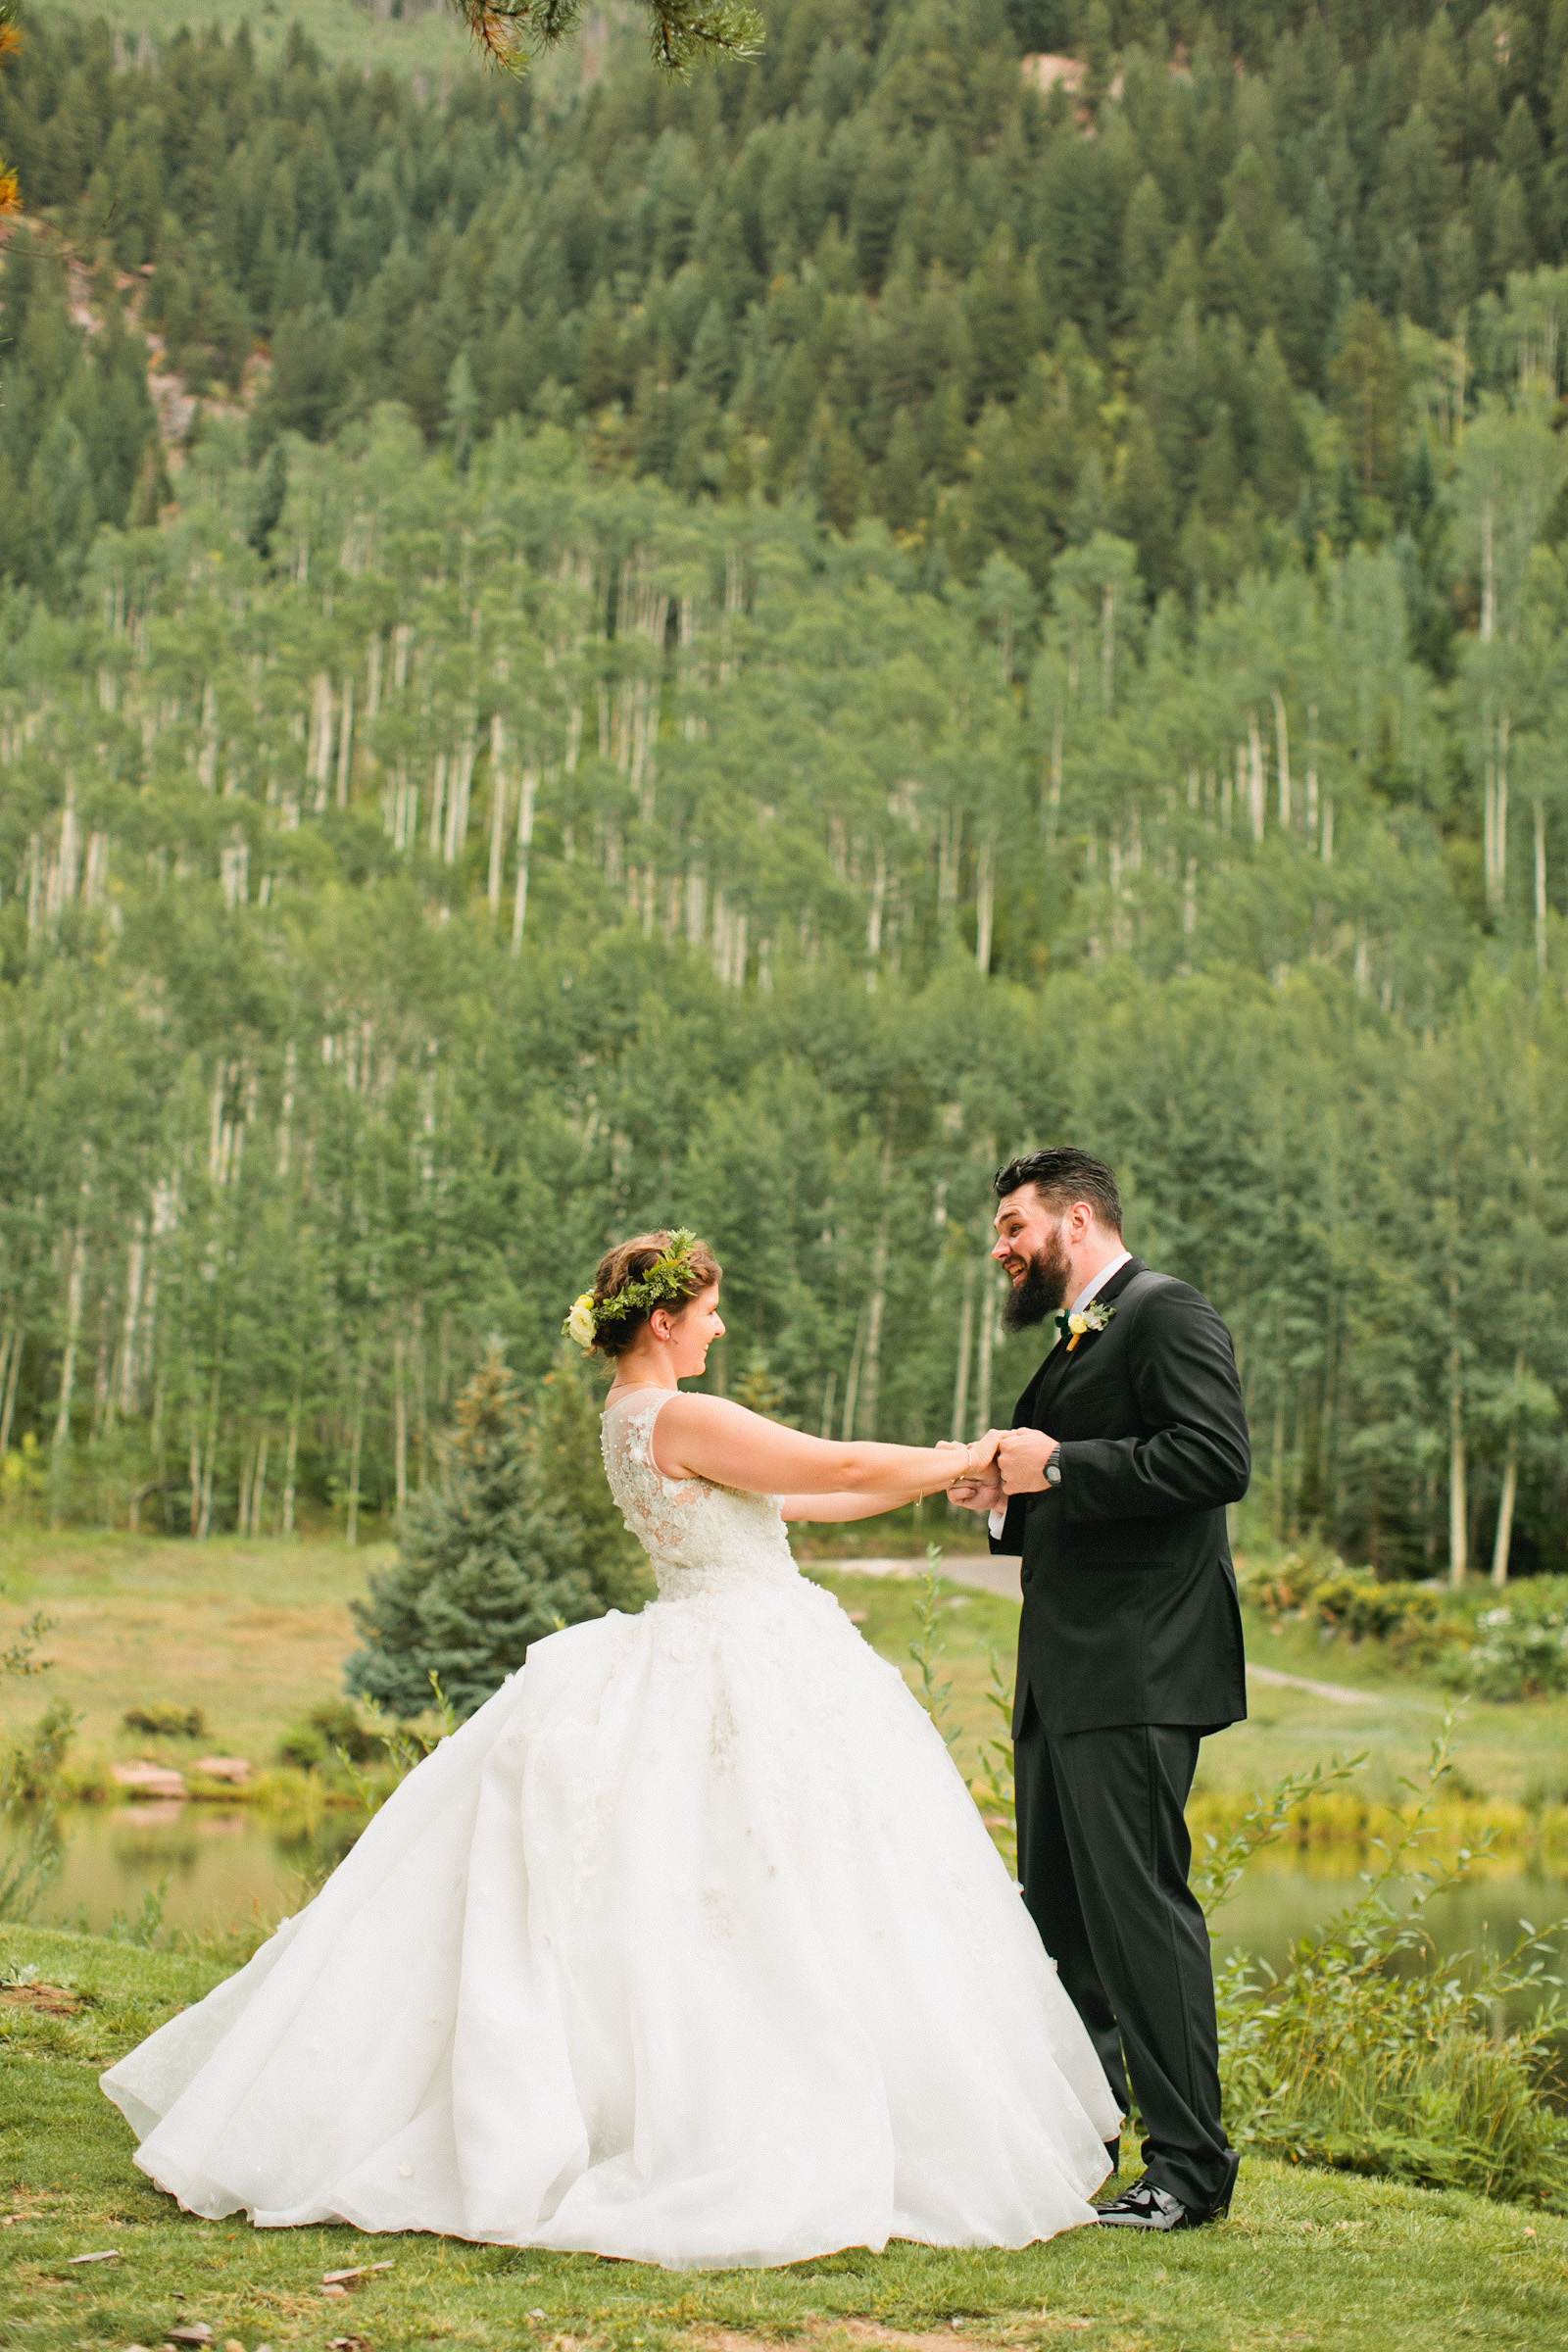 Amelia Sutton a fine art  wedding photographer specializing in  Colorado mountaintop weddings and destination weddings around the globe